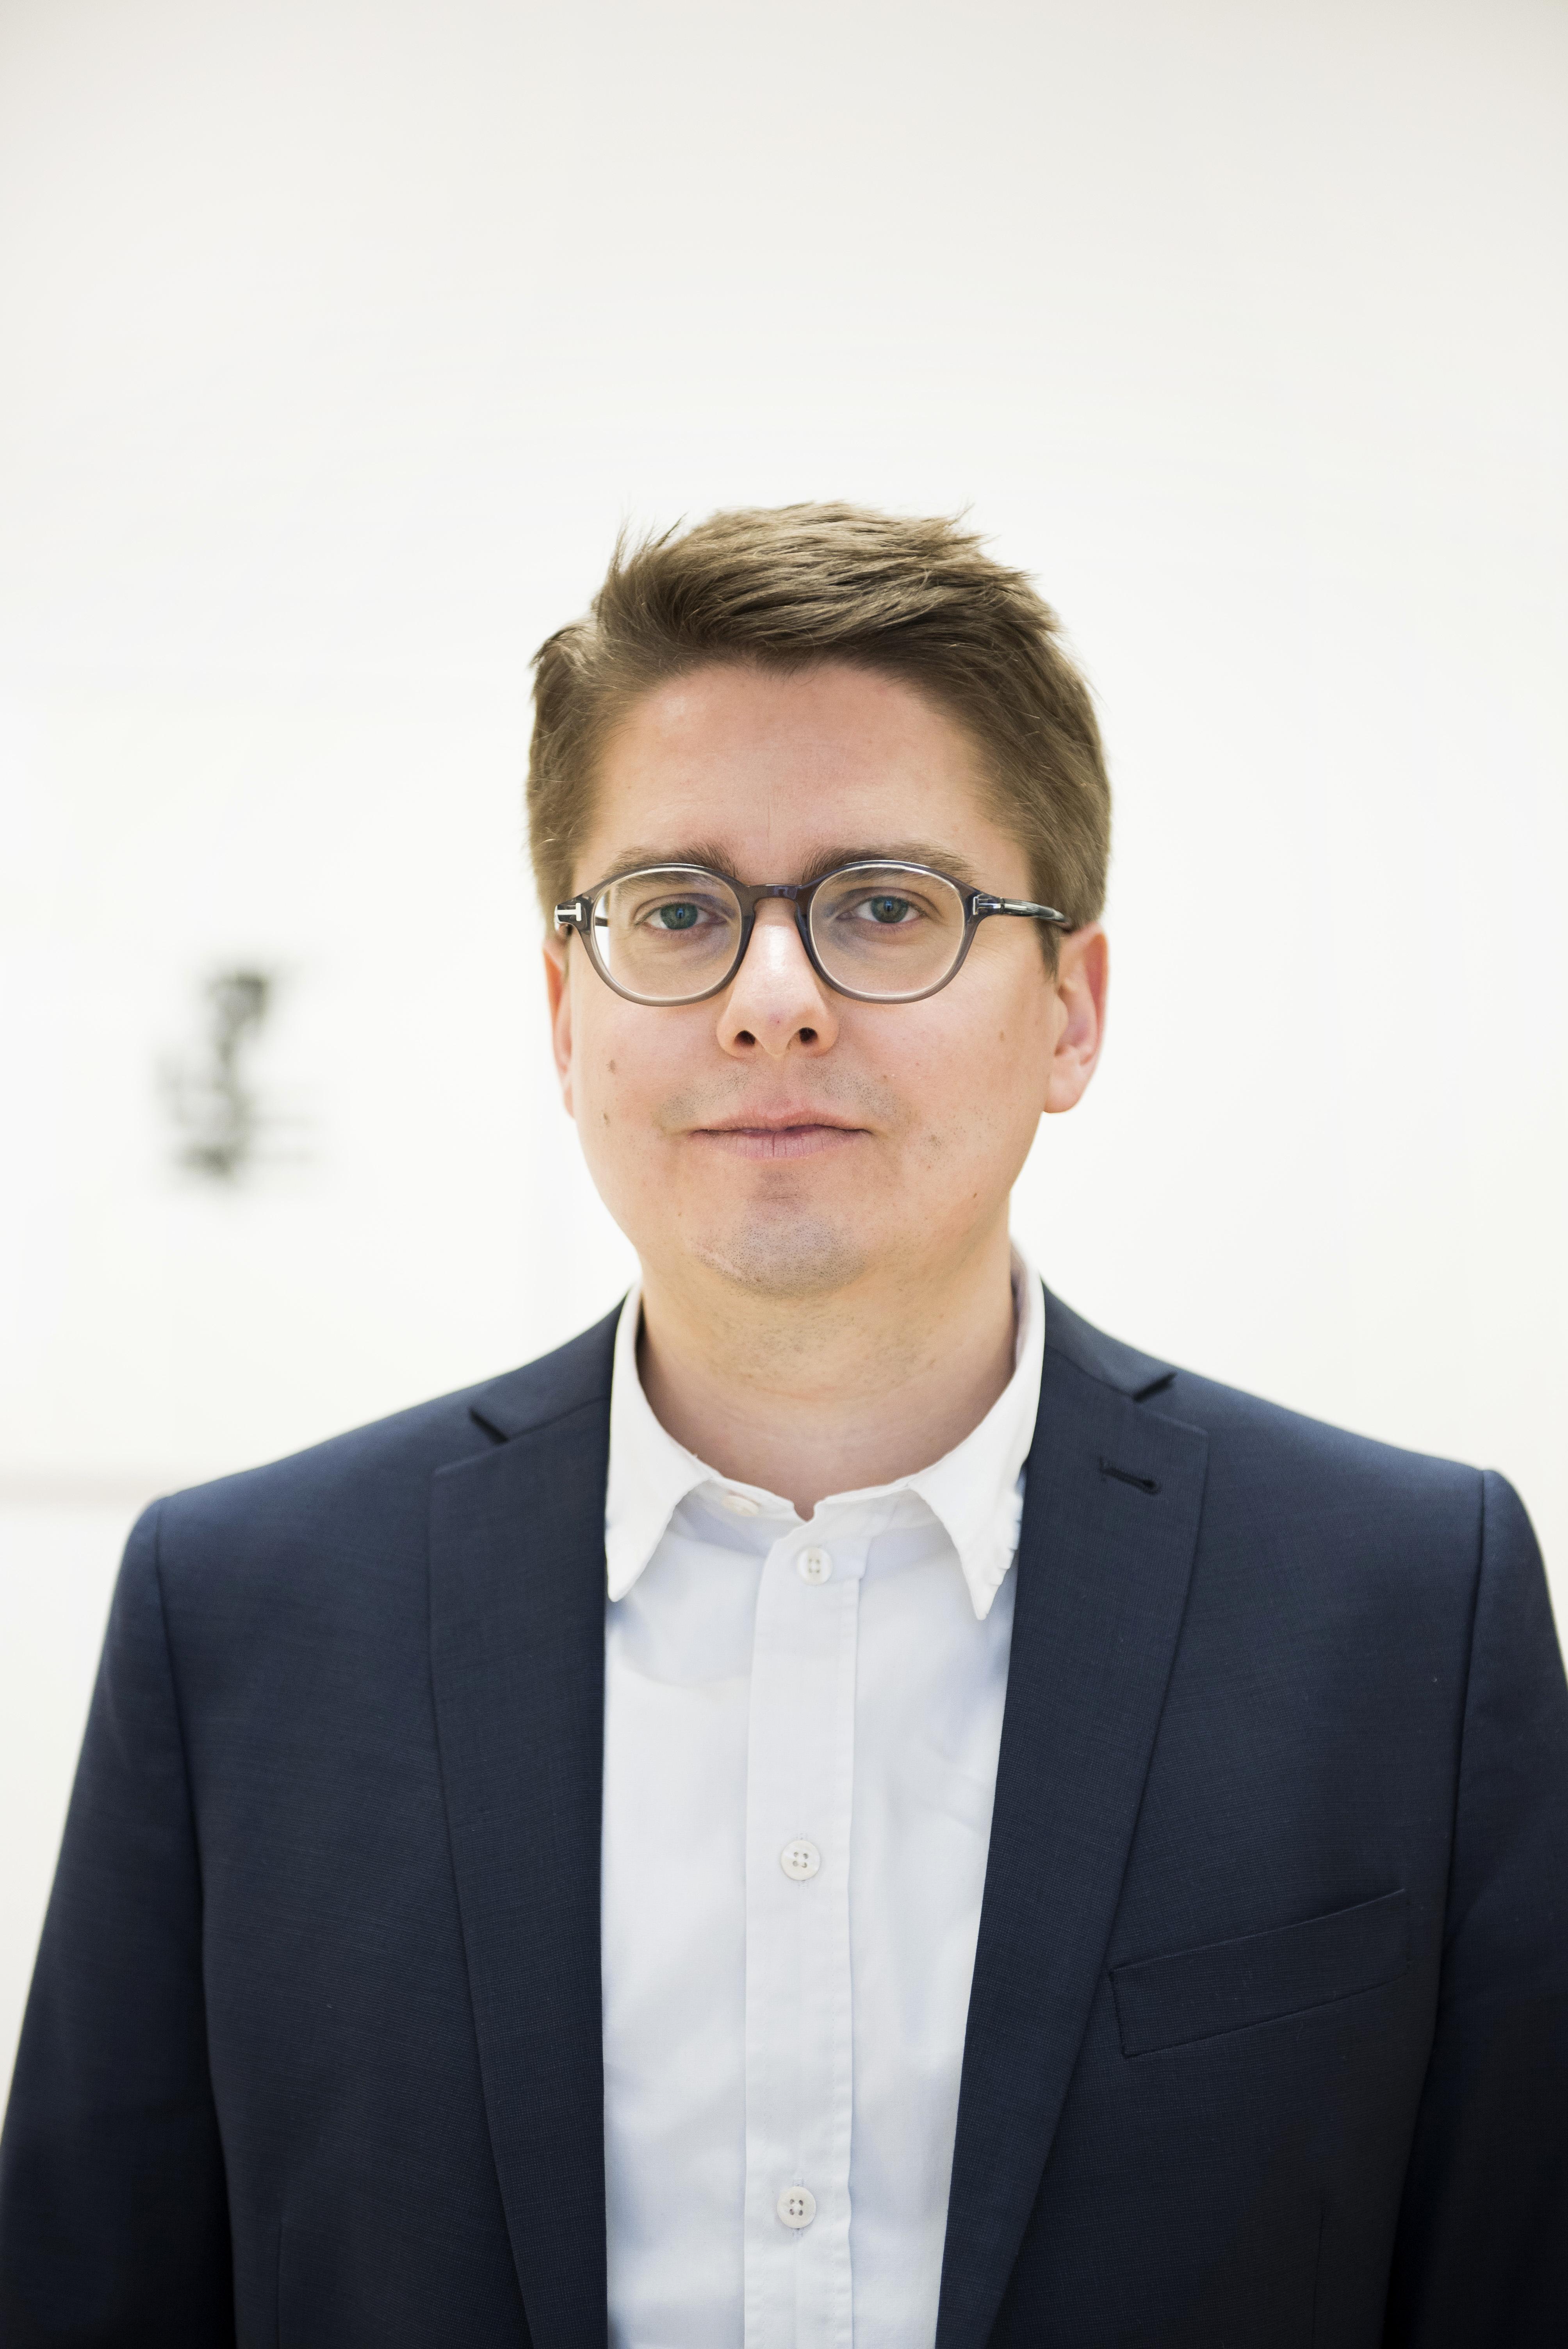 Dorian Schmelz